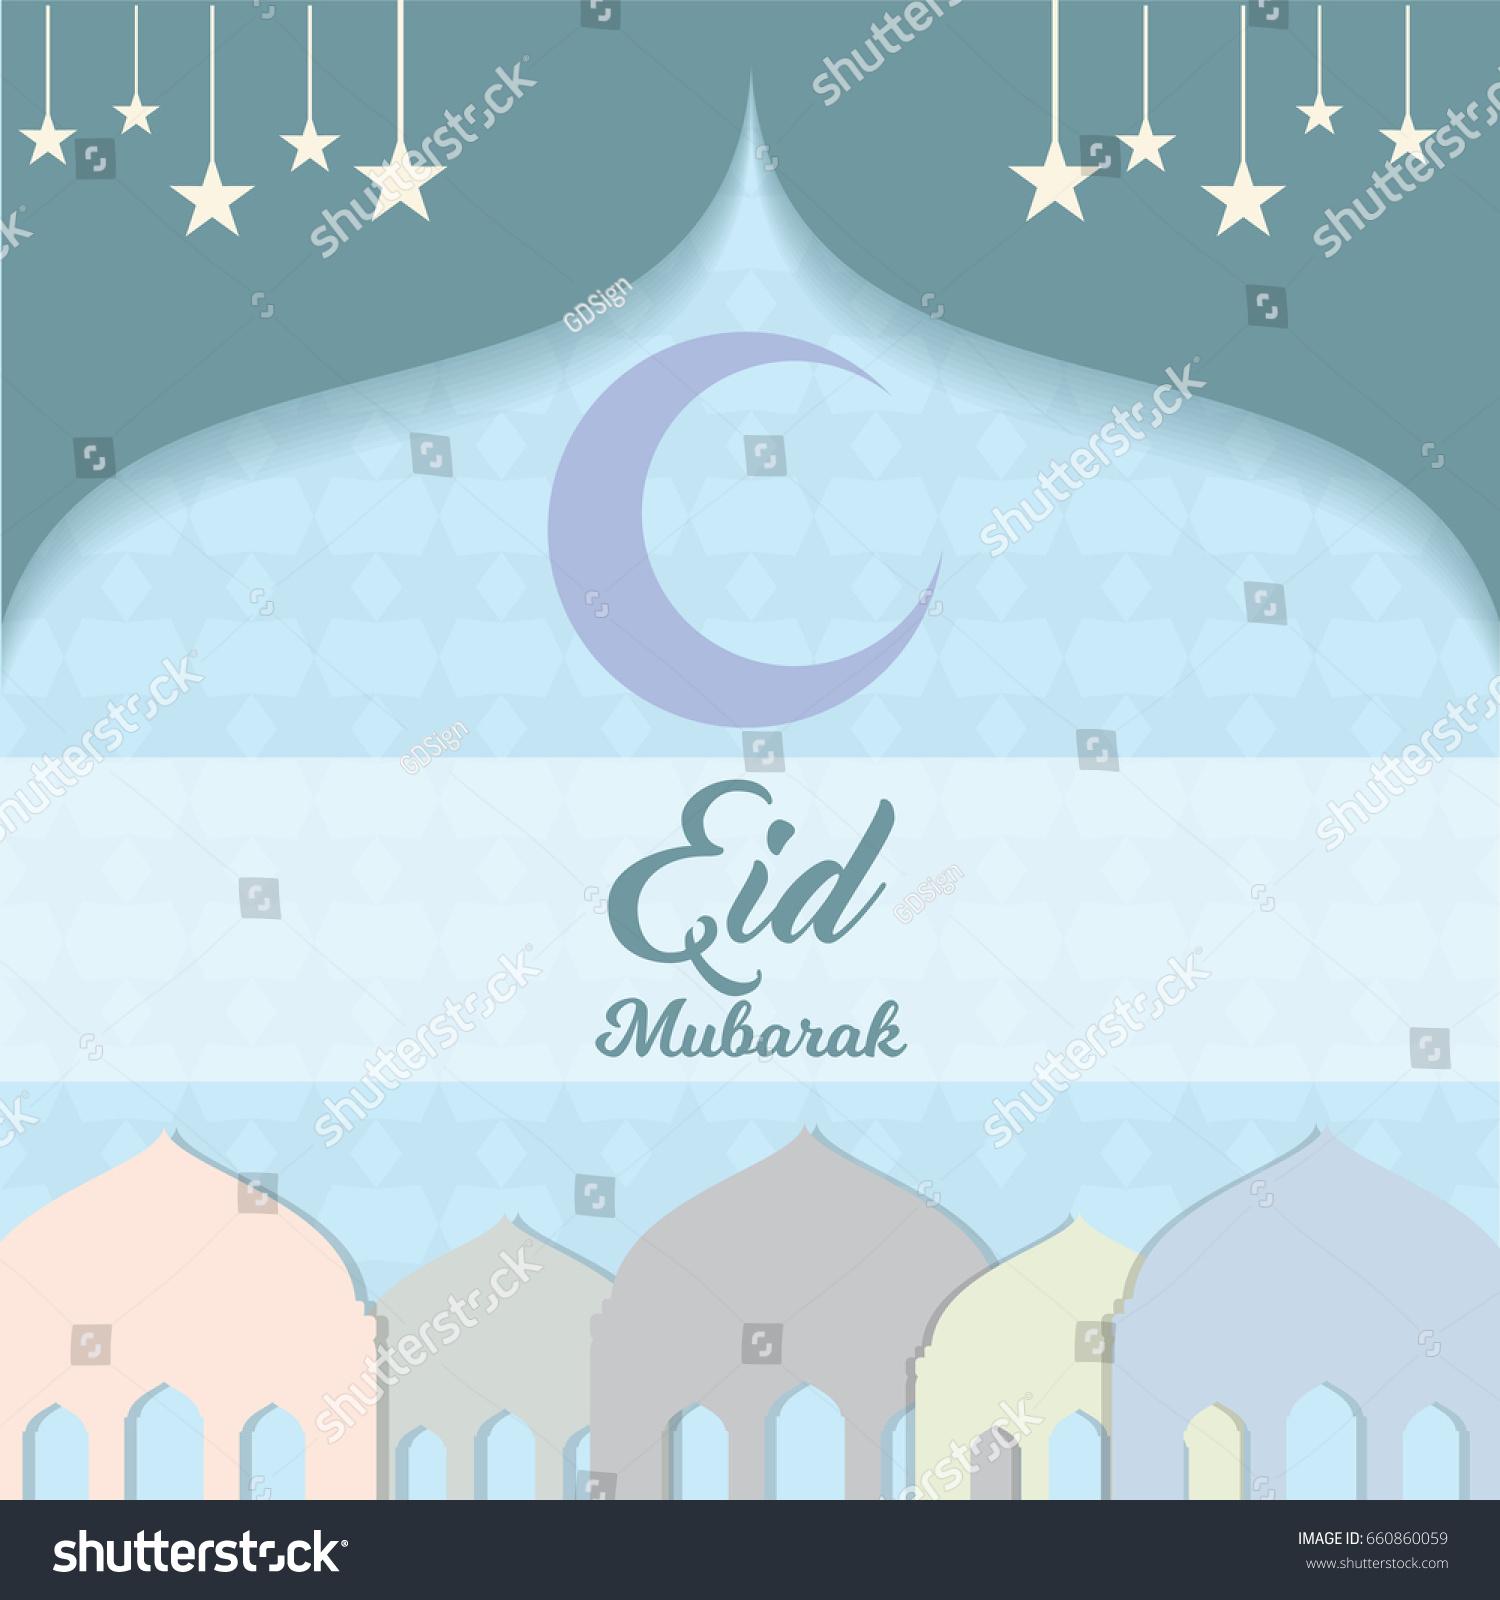 Beautiful Hijri Eid Al-Fitr Greeting - stock-vector-muslim-eid-al-fitr-greeting-card-blue-islamic-vector-illustration-660860059  Pictures_495636 .jpg